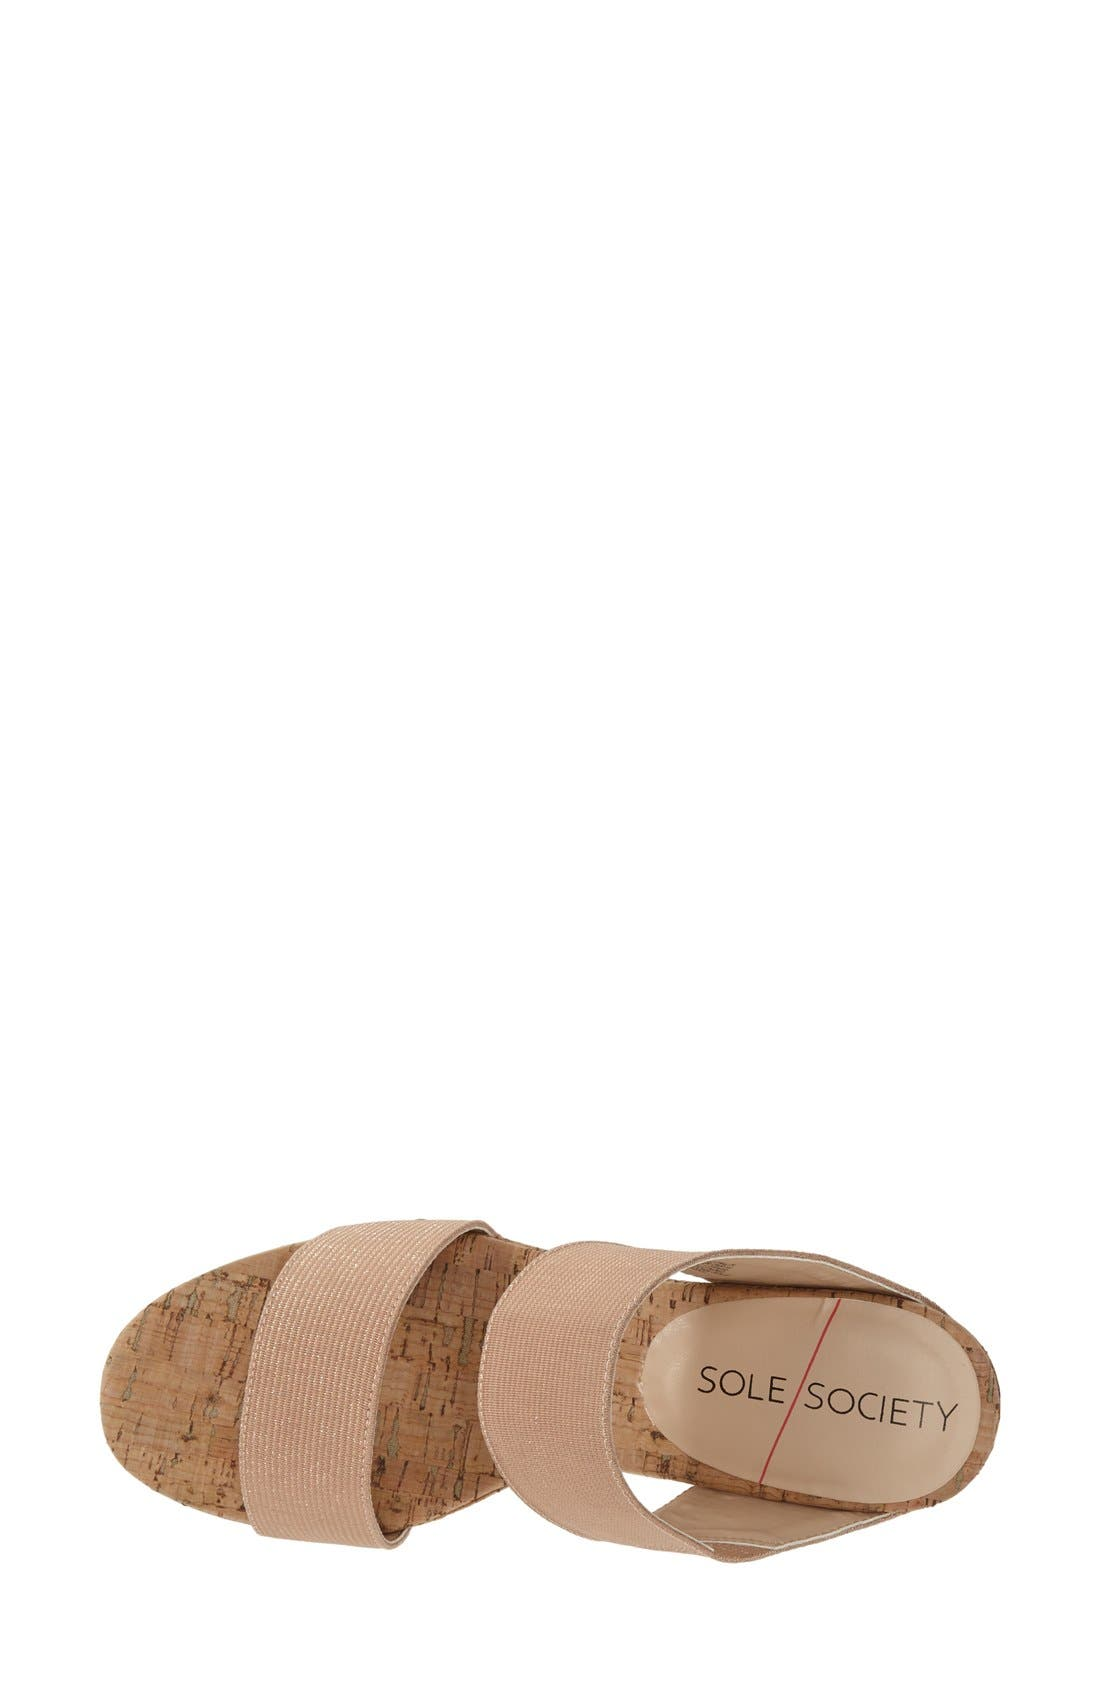 'Emilia 2' Wedge Sandal,                             Alternate thumbnail 6, color,